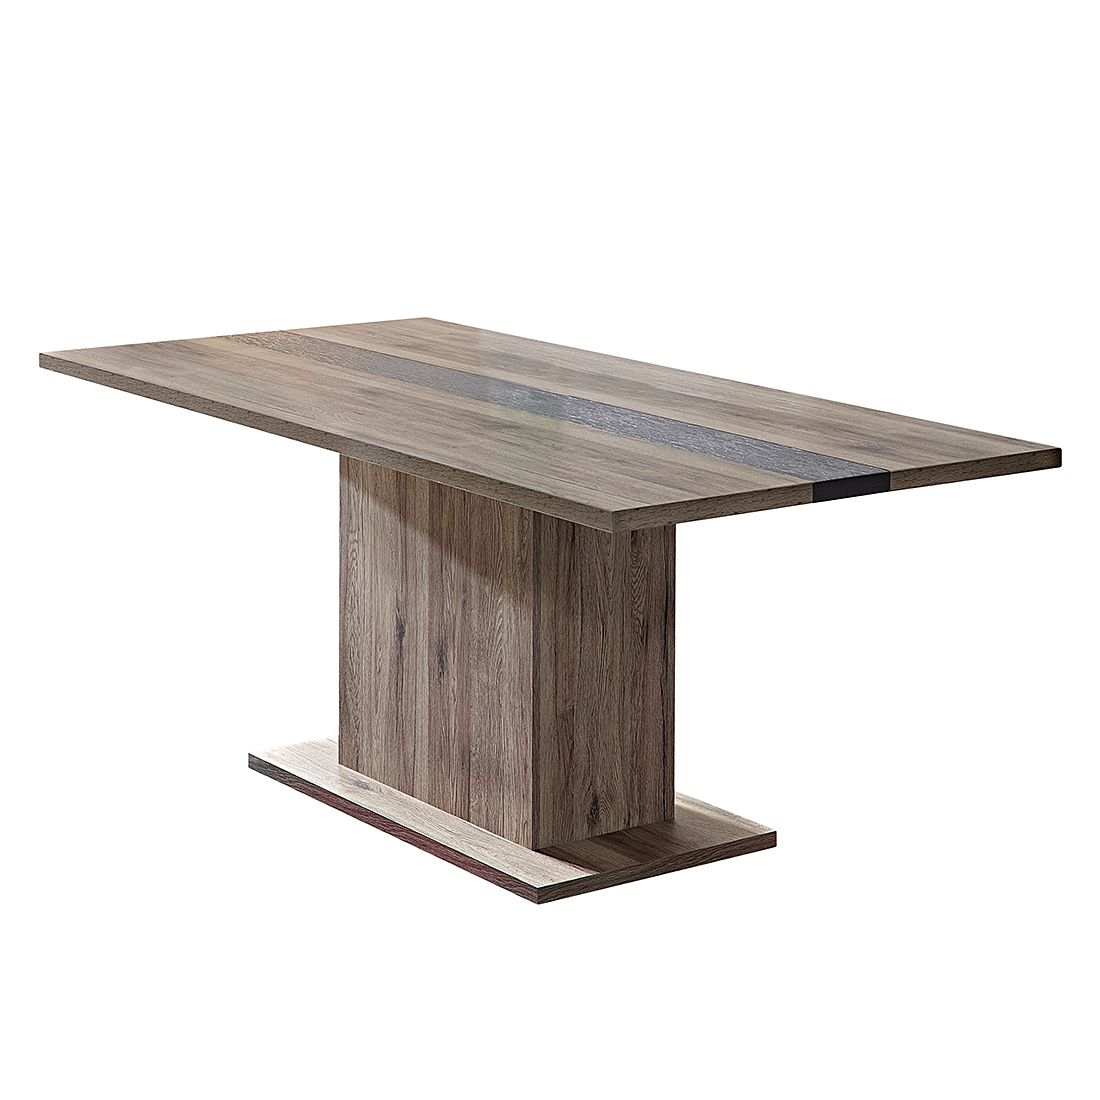 Table de salle à manger Adorno - Imitation chêne de San Remo / Imitation ardoise, Fredriks